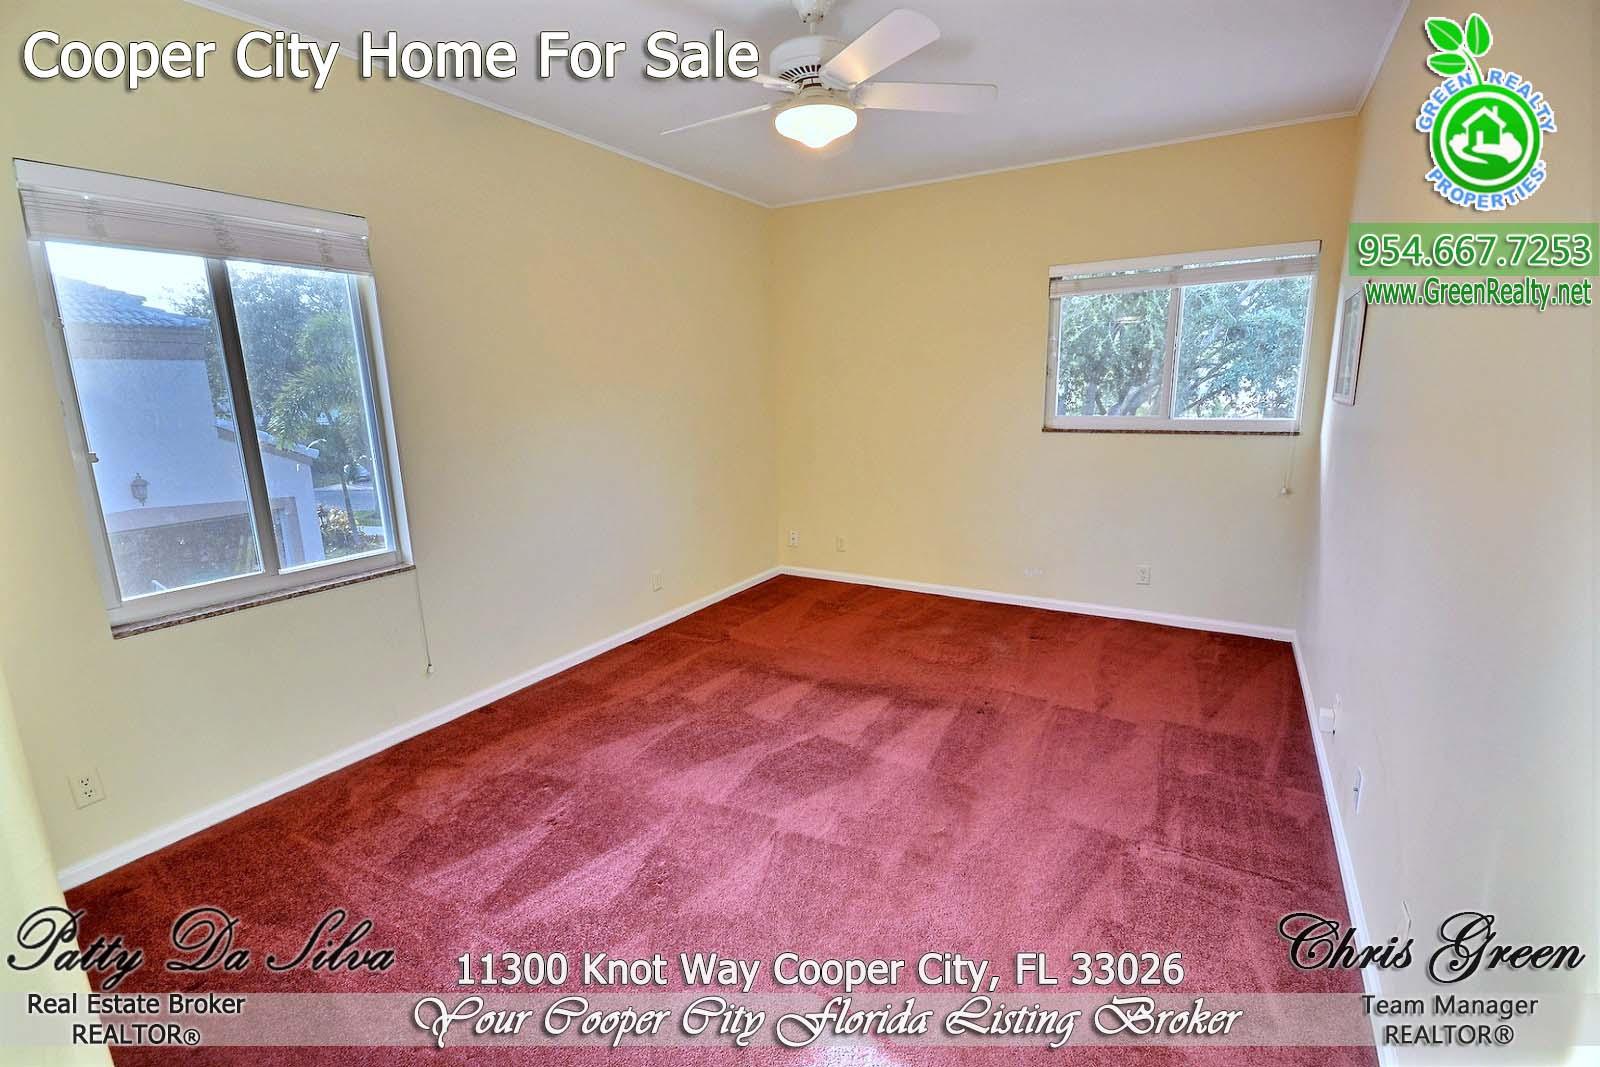 43 East Landing Rock Creek Homes For Sale (5)